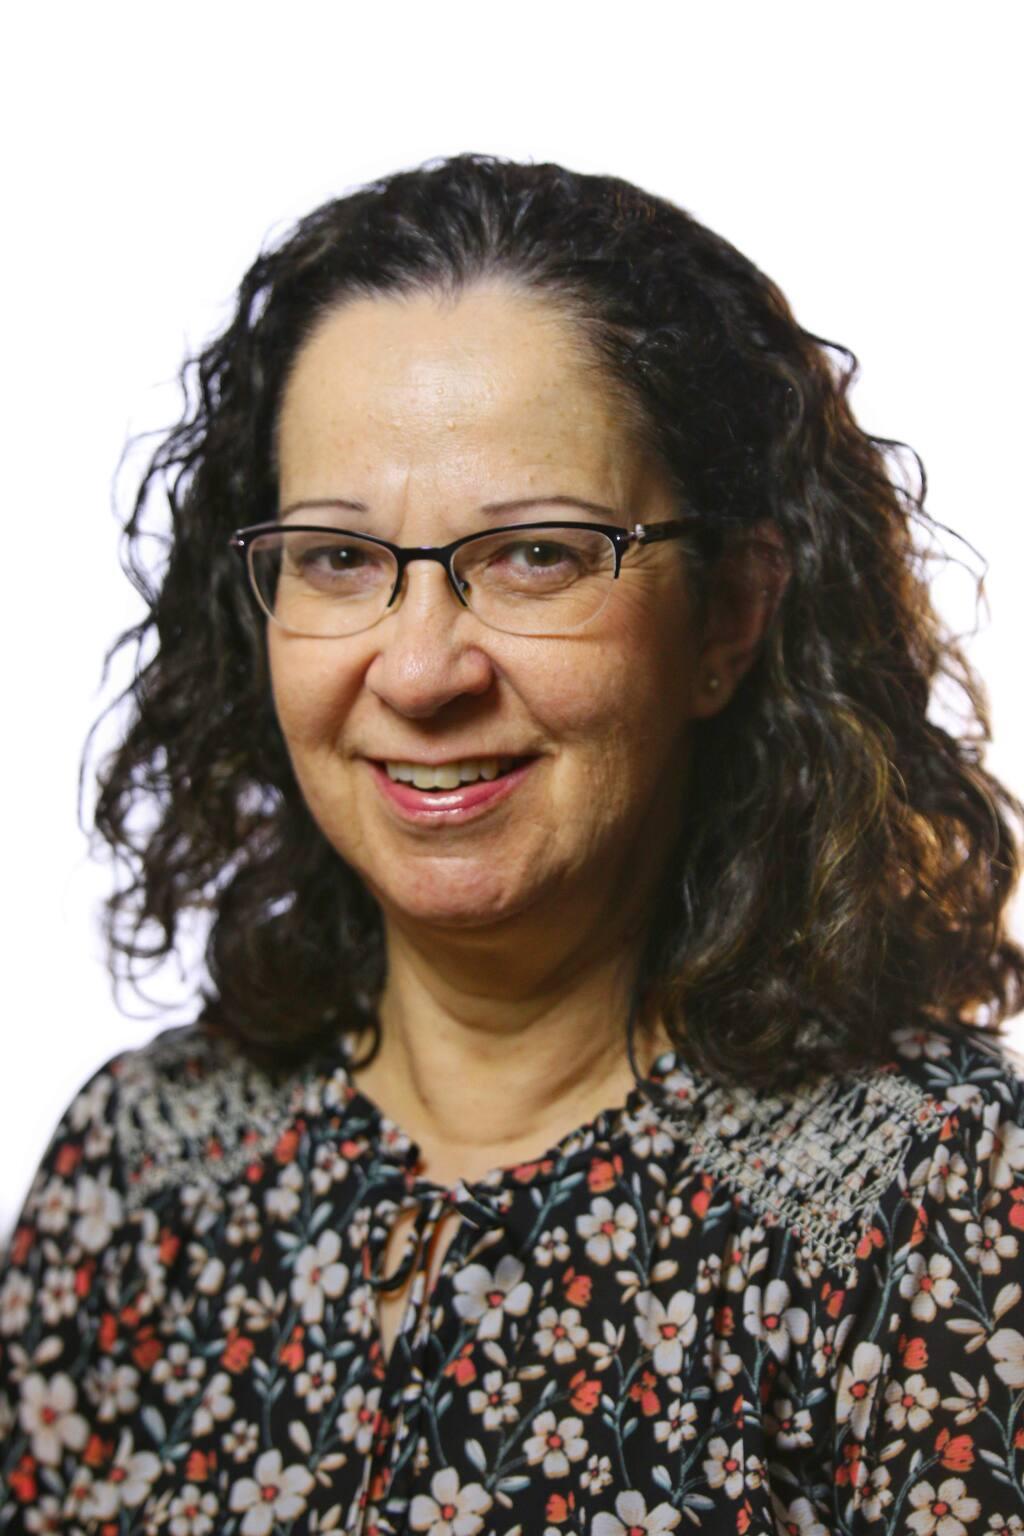 Cheryl Sarfaty, staff reporter, North Bay Business Journal (JEFF QUACKENBUSH / NORTH BAY BUSINESS JOURNAL) July 18, 2018